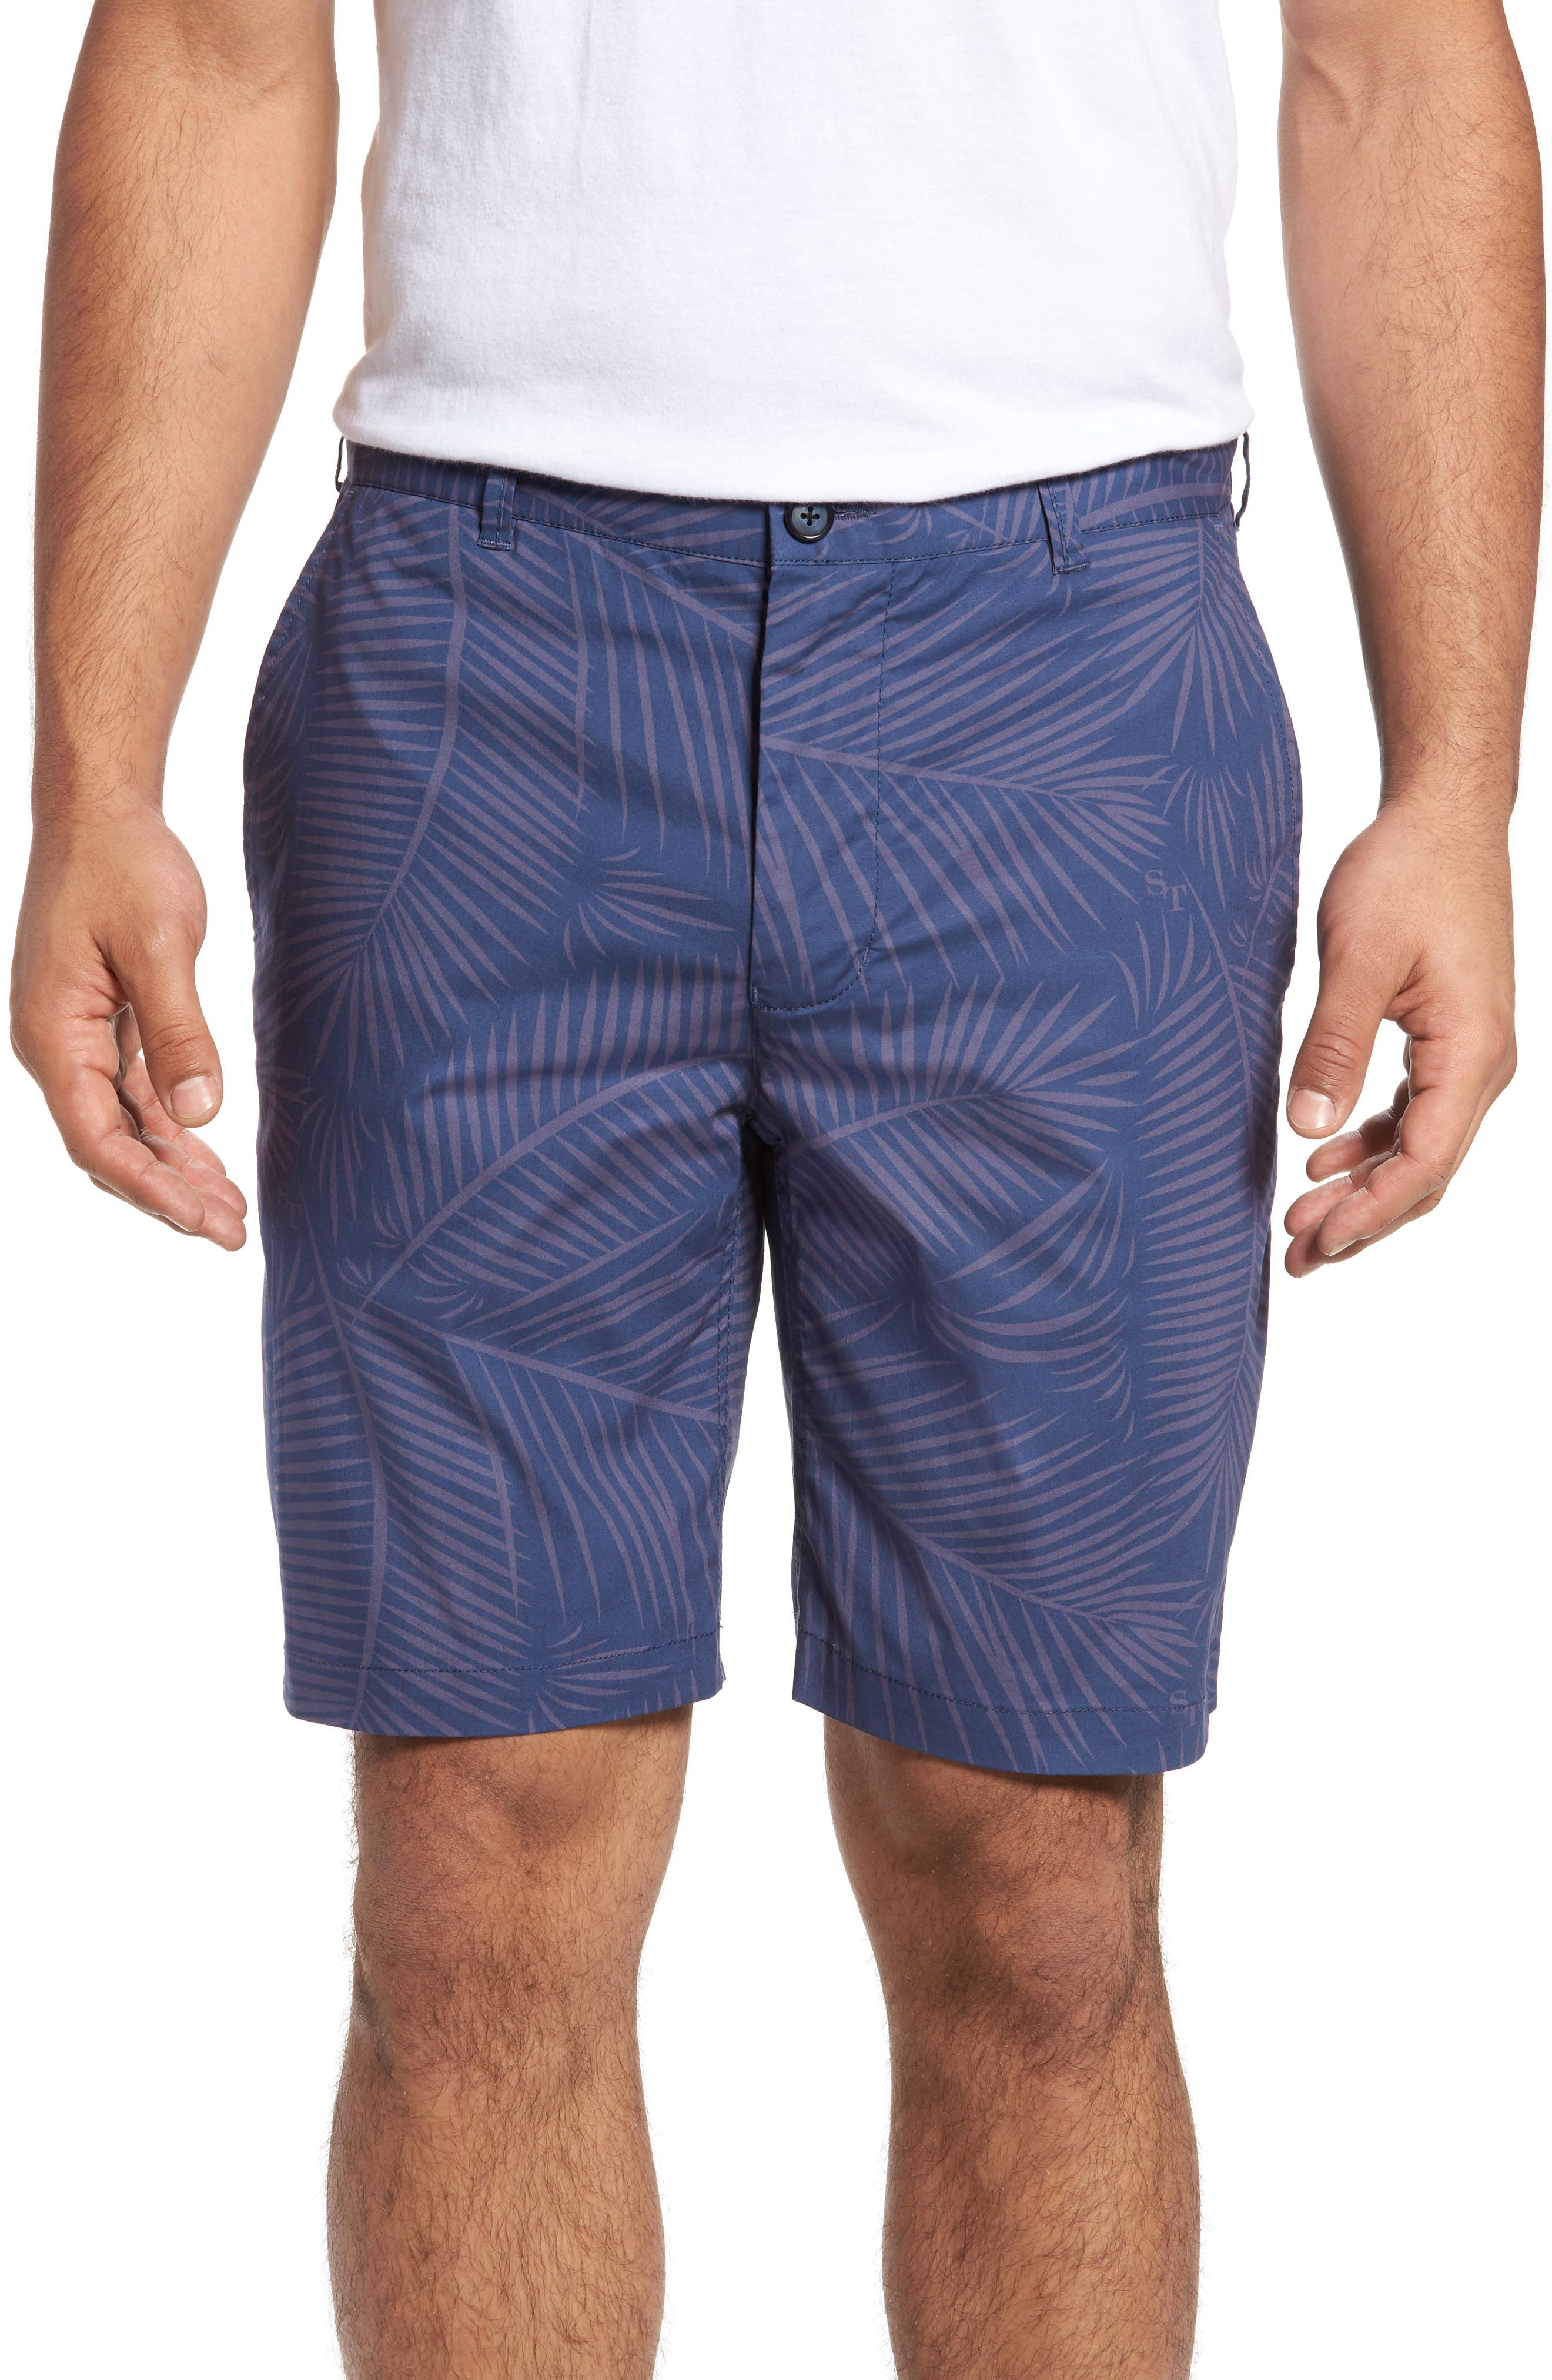 Pelican Peak Shorts,                             Main thumbnail 1, color,                             425